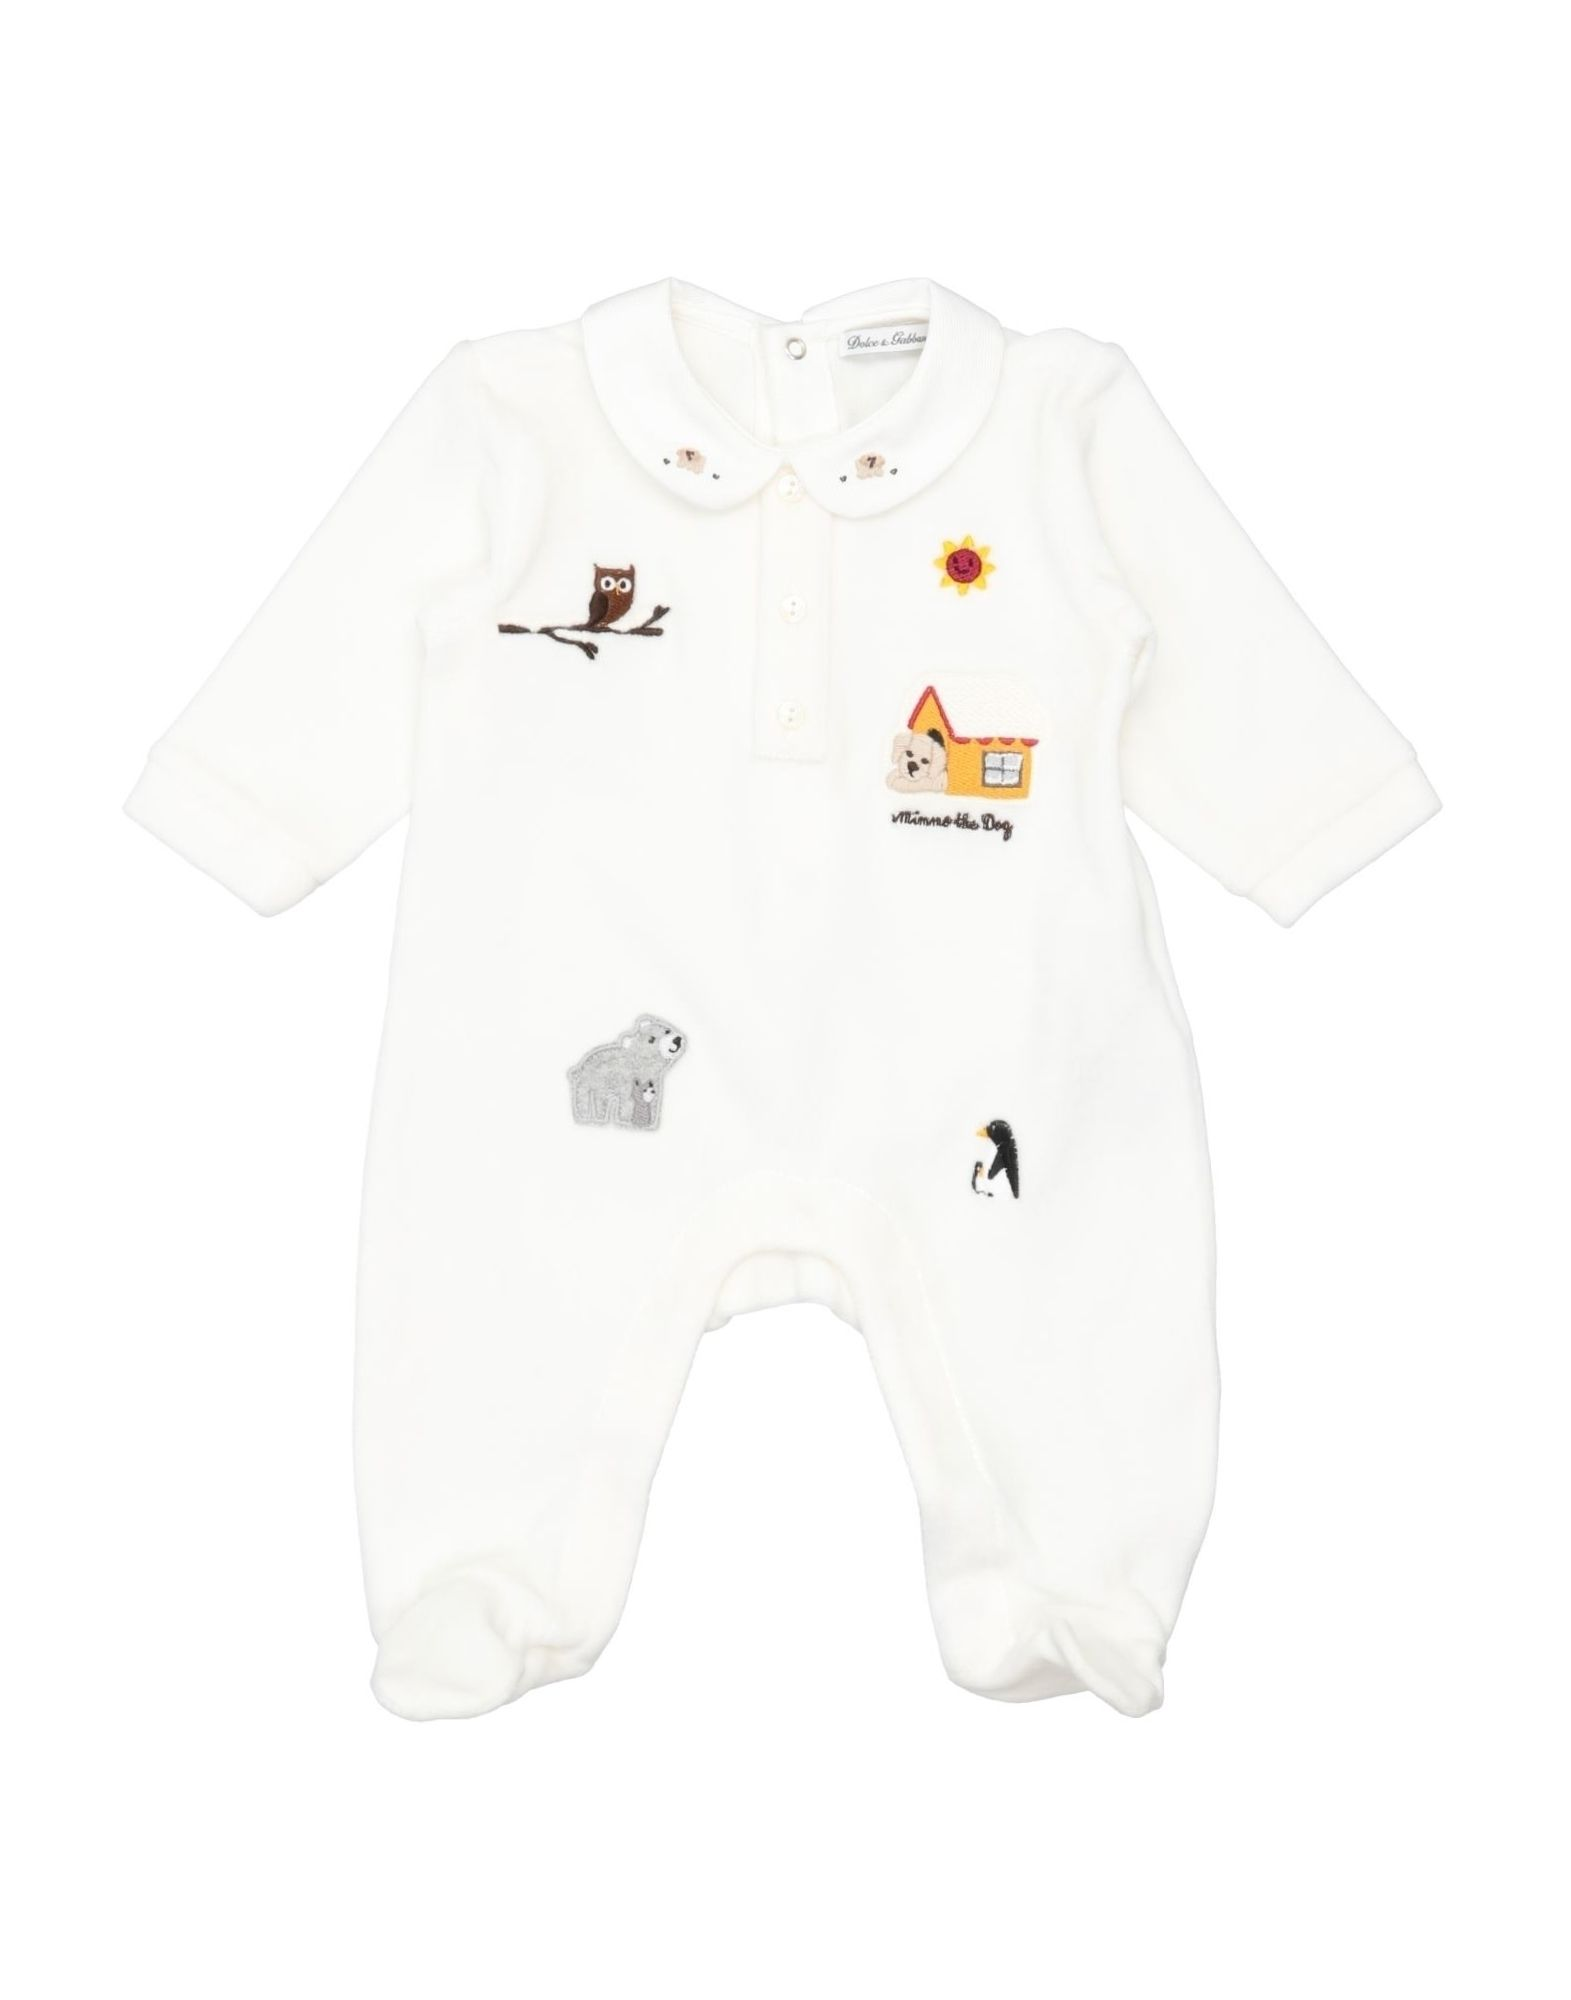 DOLCE & GABBANA Baby jumpsuits - Item 15029095